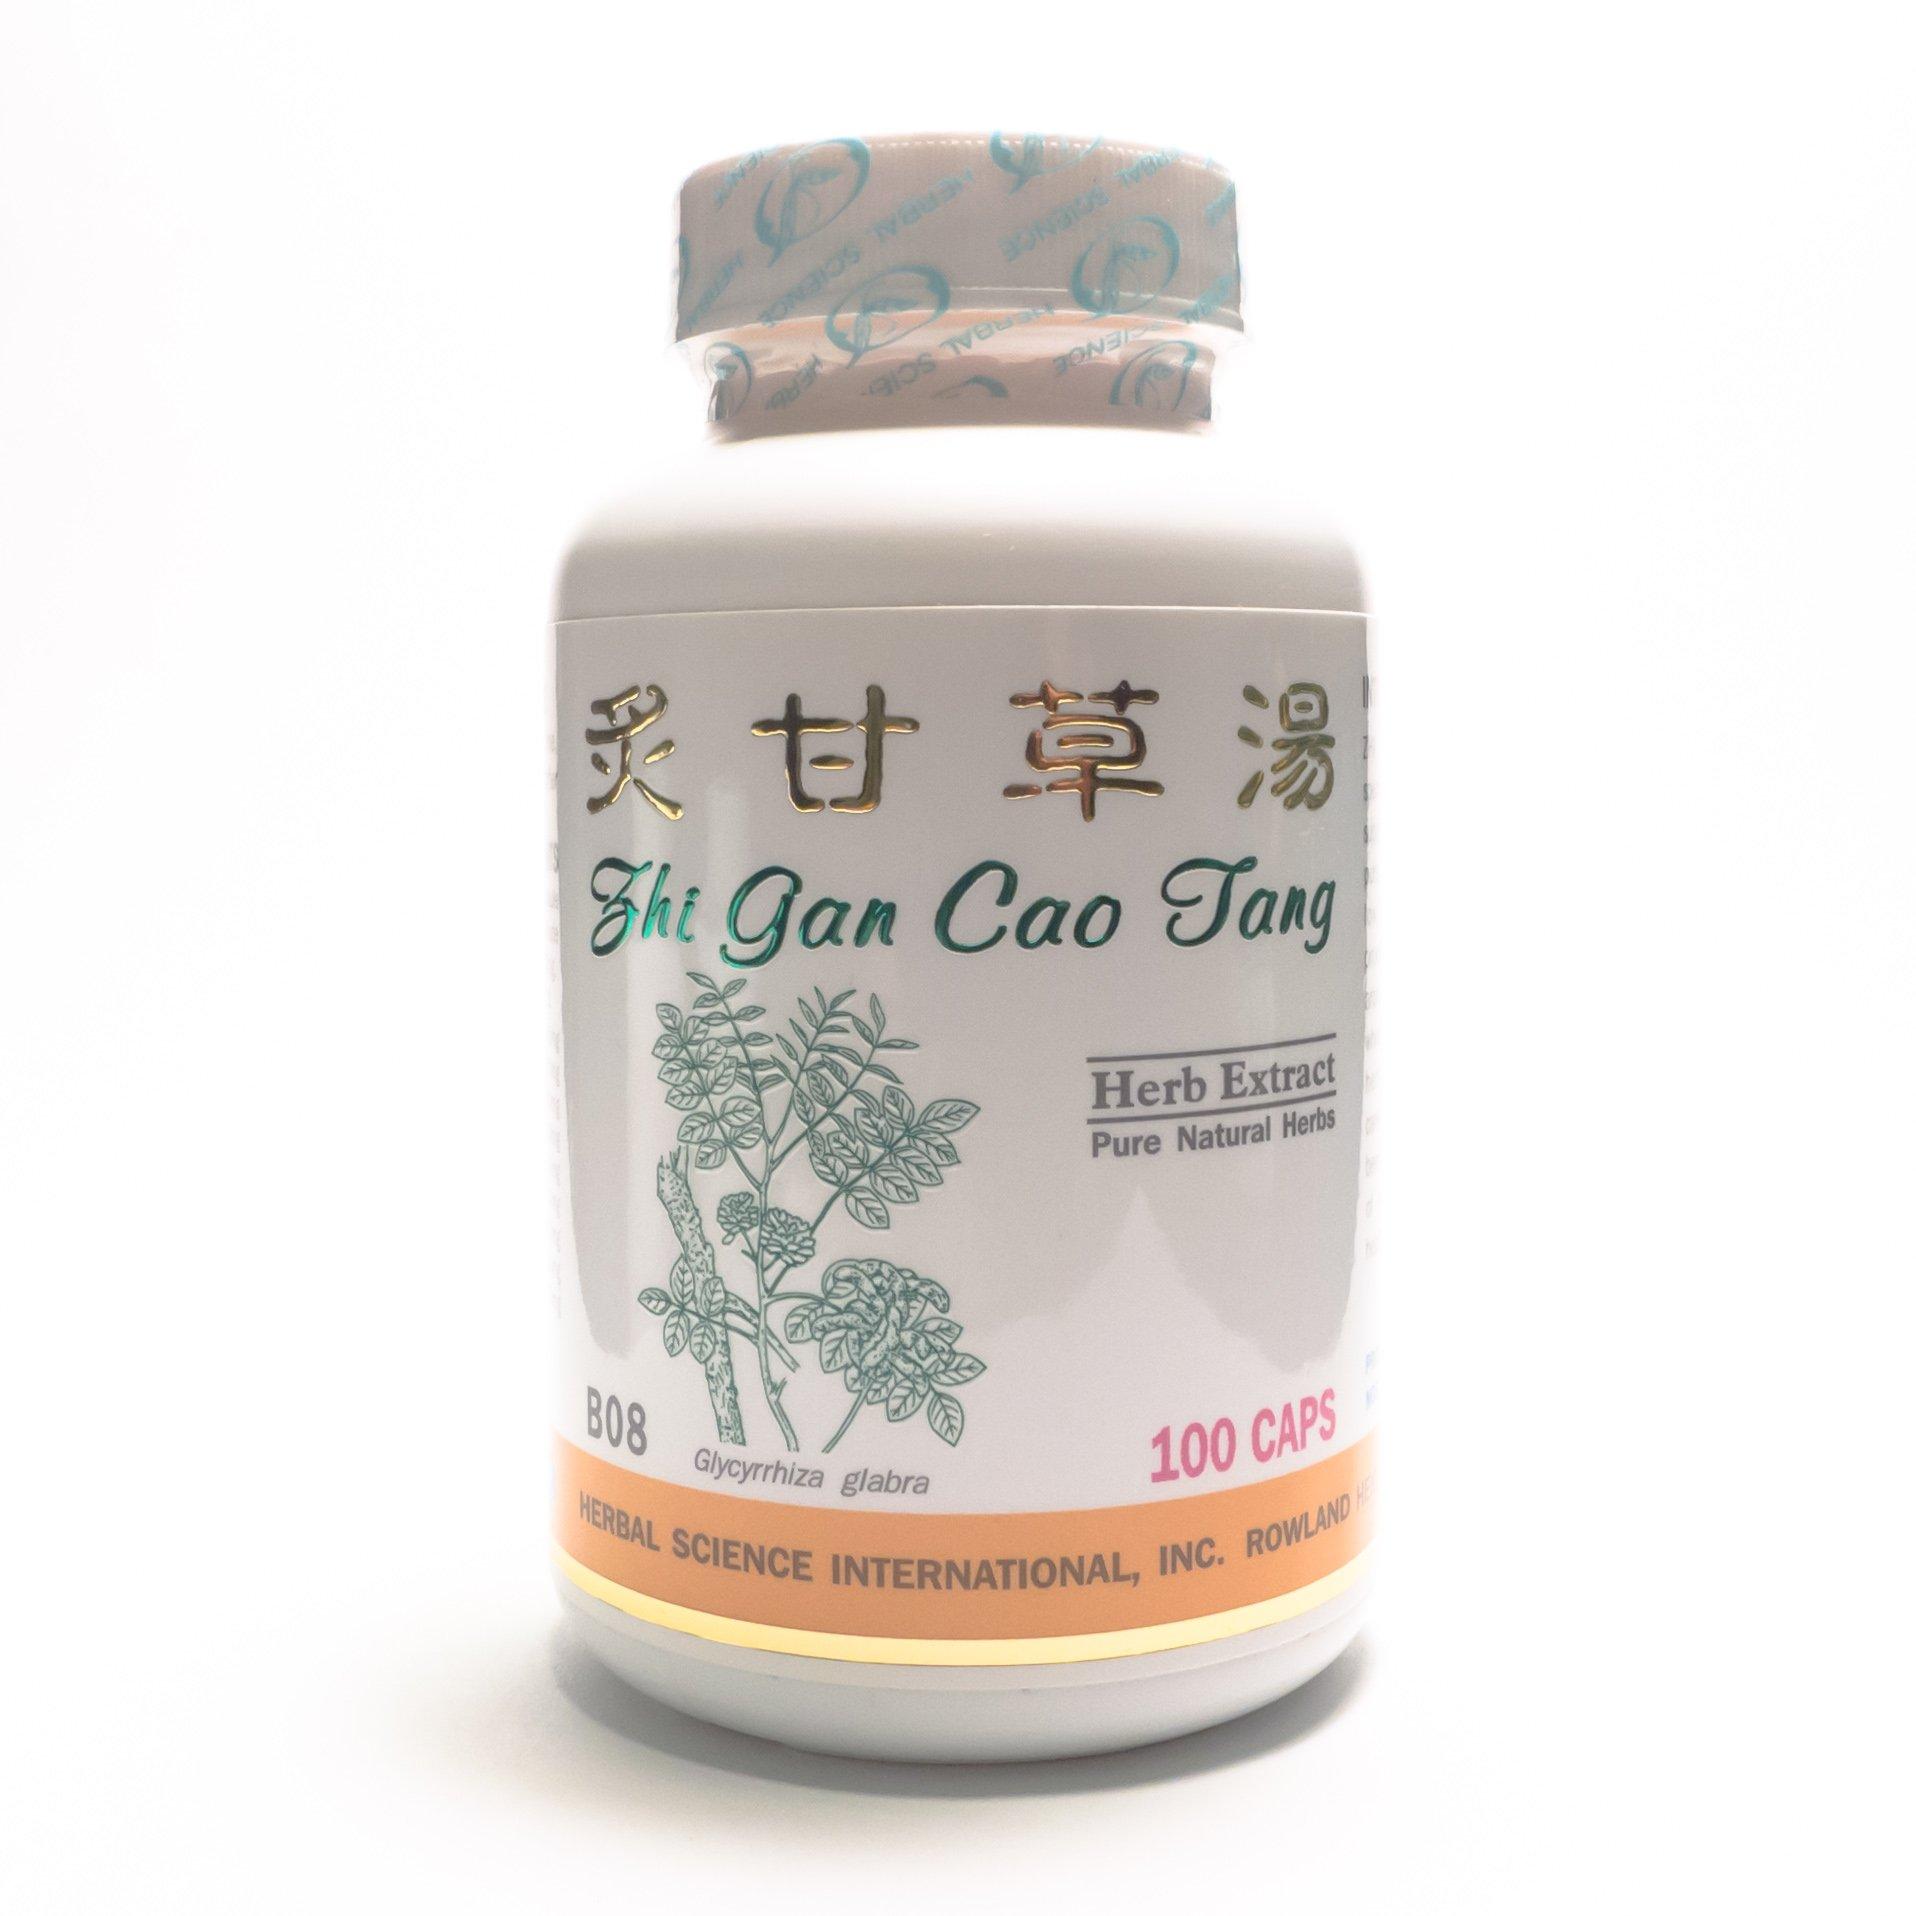 Honey Licorice Formula Dietary Supplement 500mg 100 capsules (Zhi Gan Cao Tang) B08 100% Natural Herbs